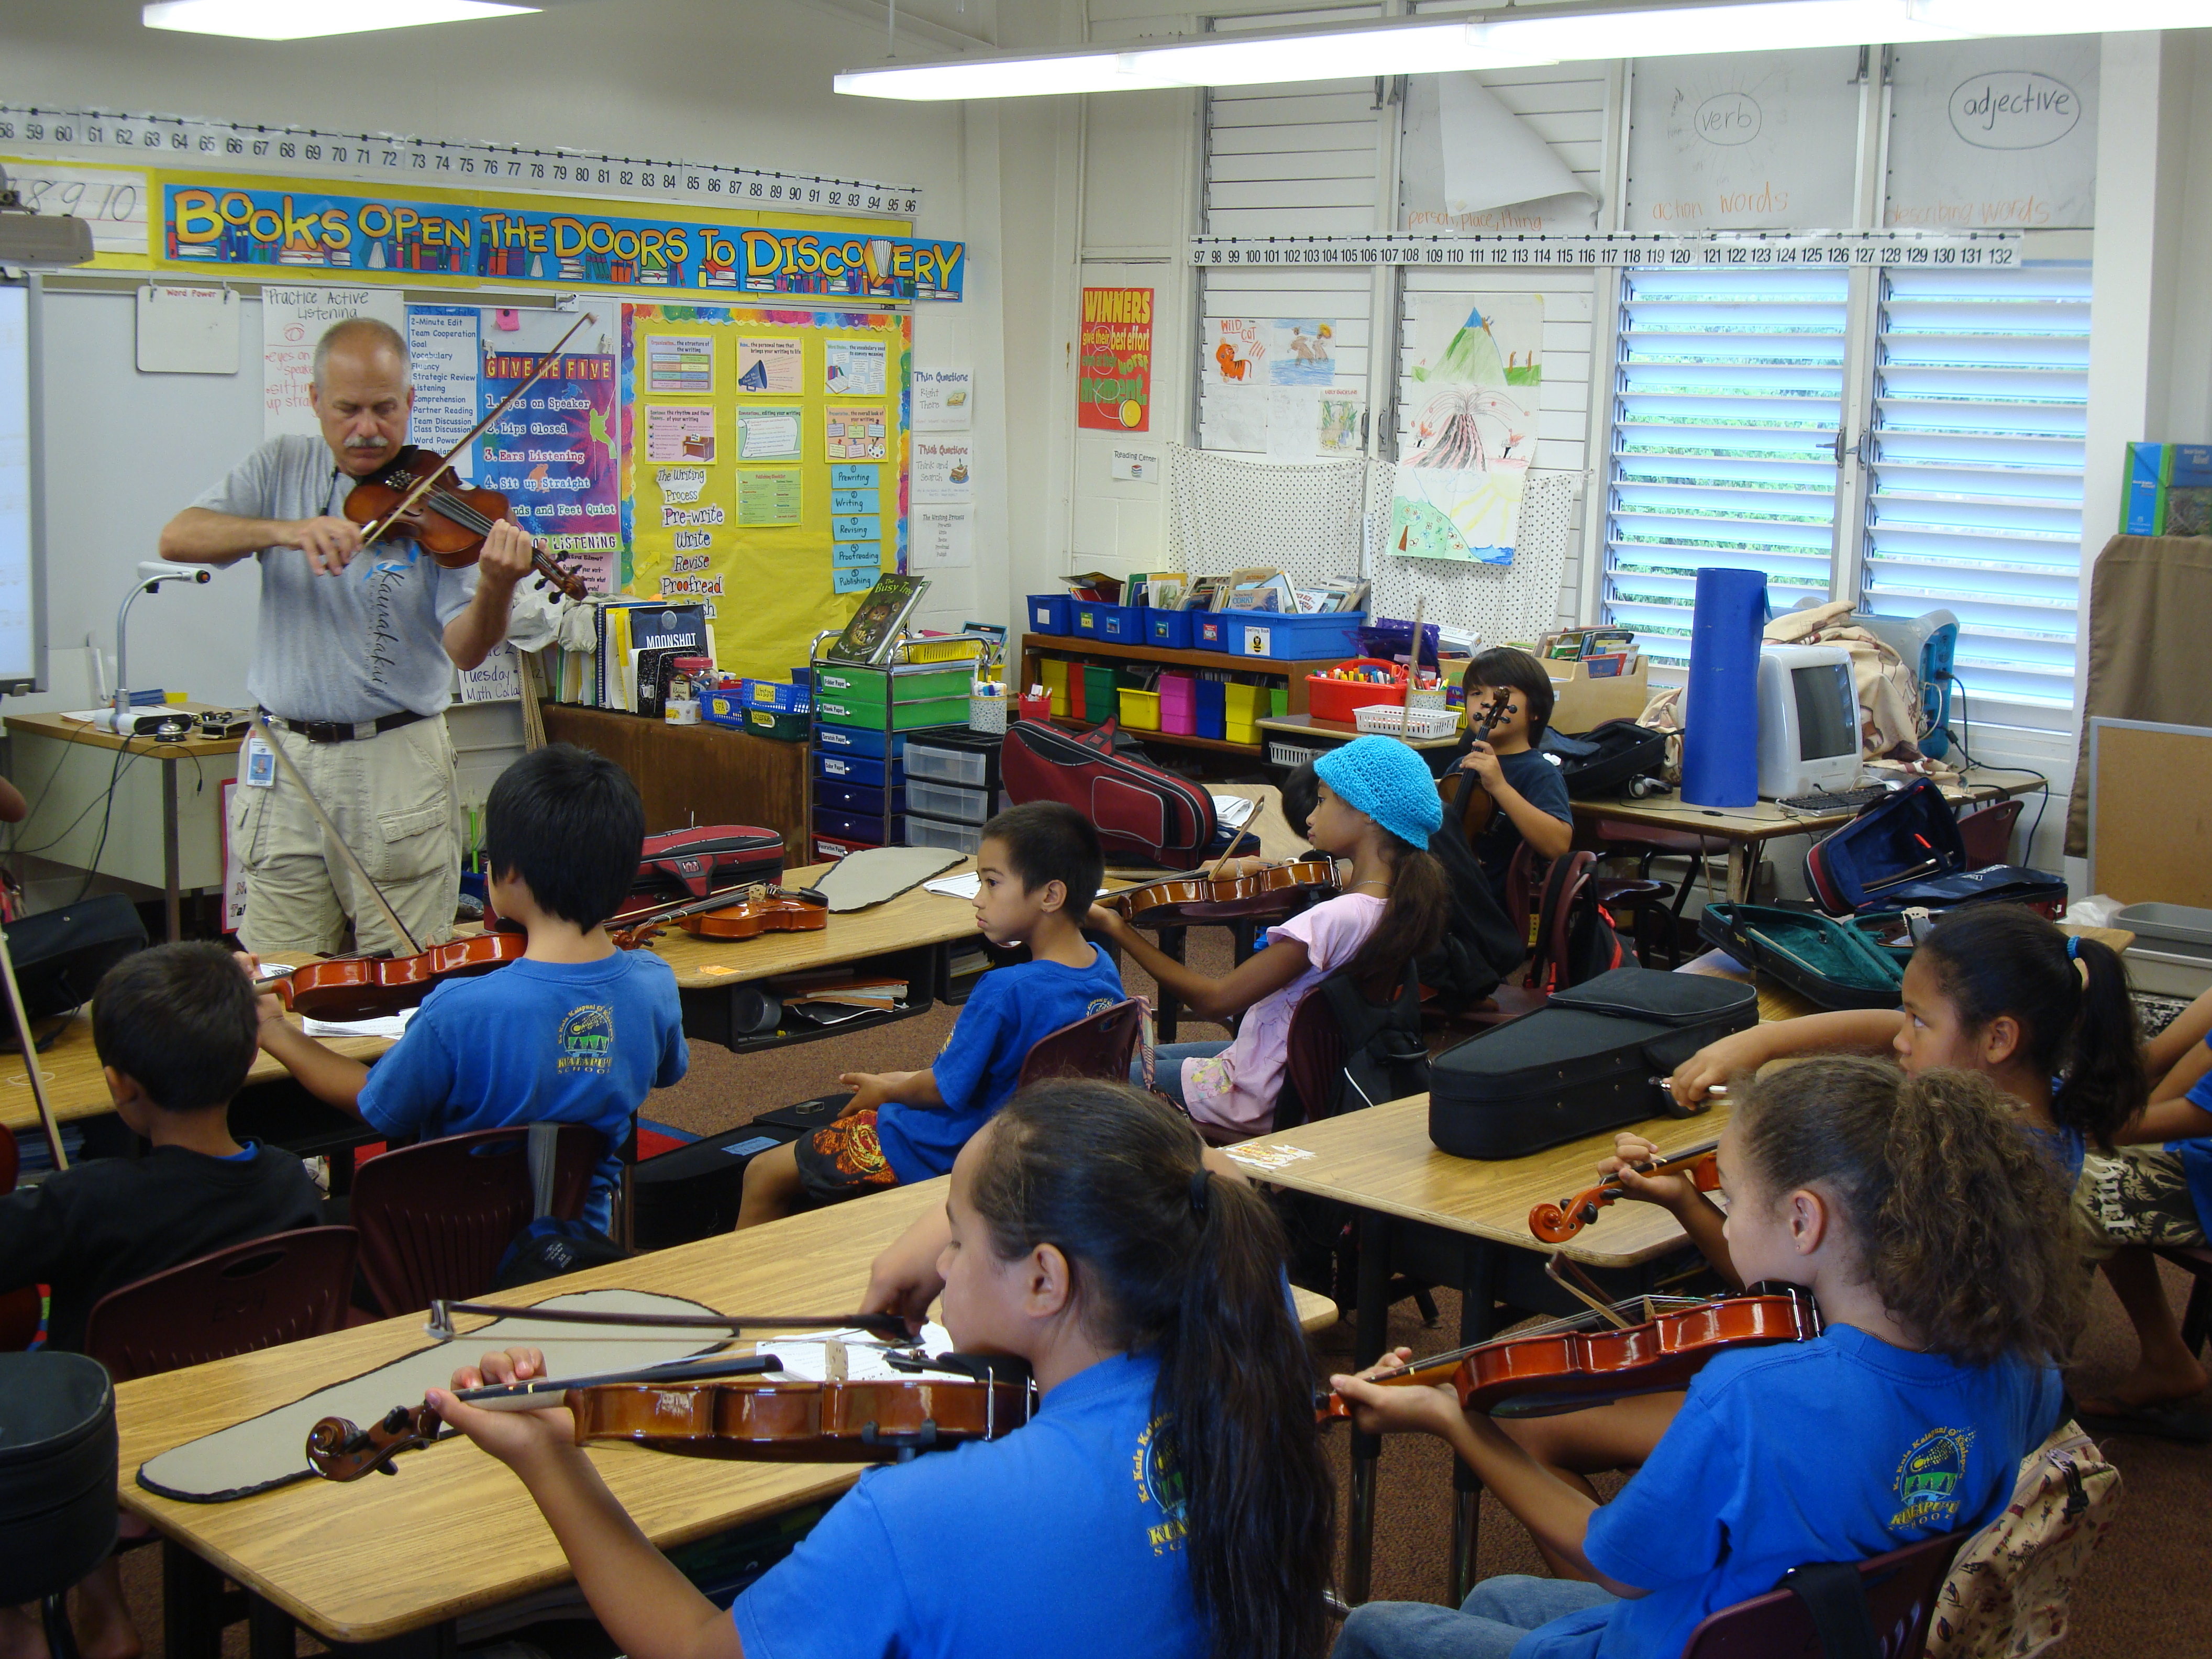 Kualapuu Violin Class